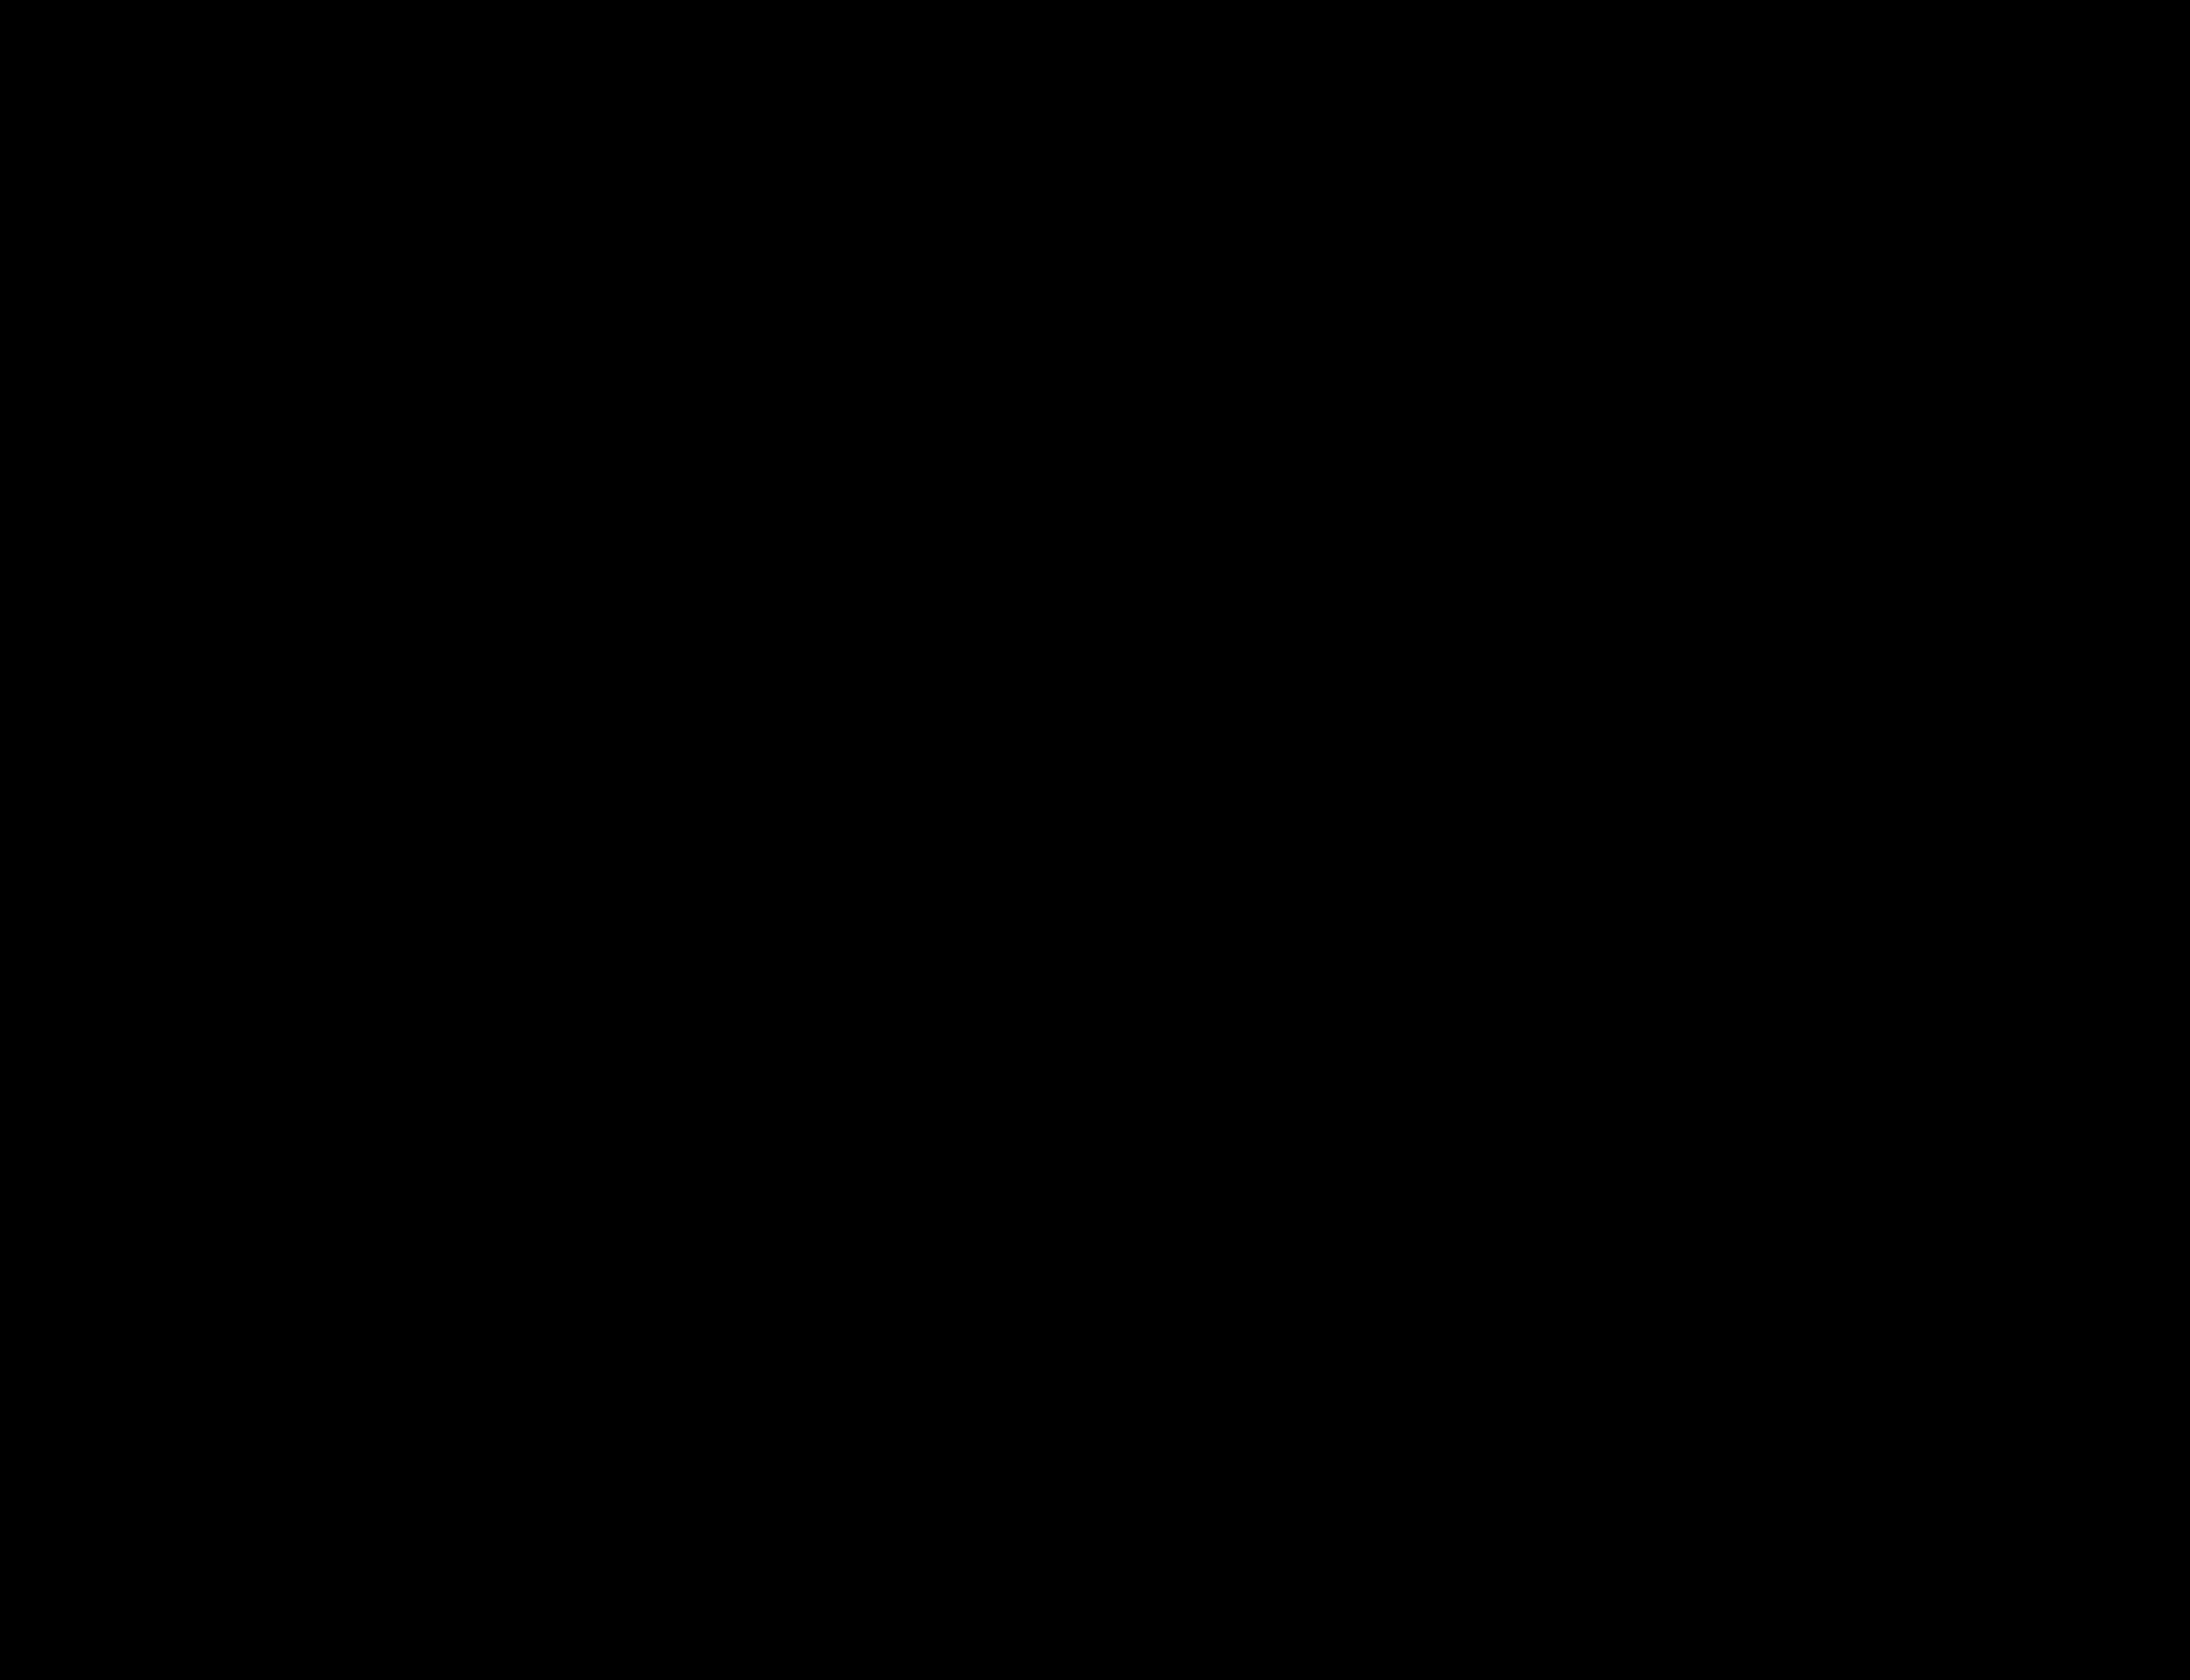 2400x1841 Clipart